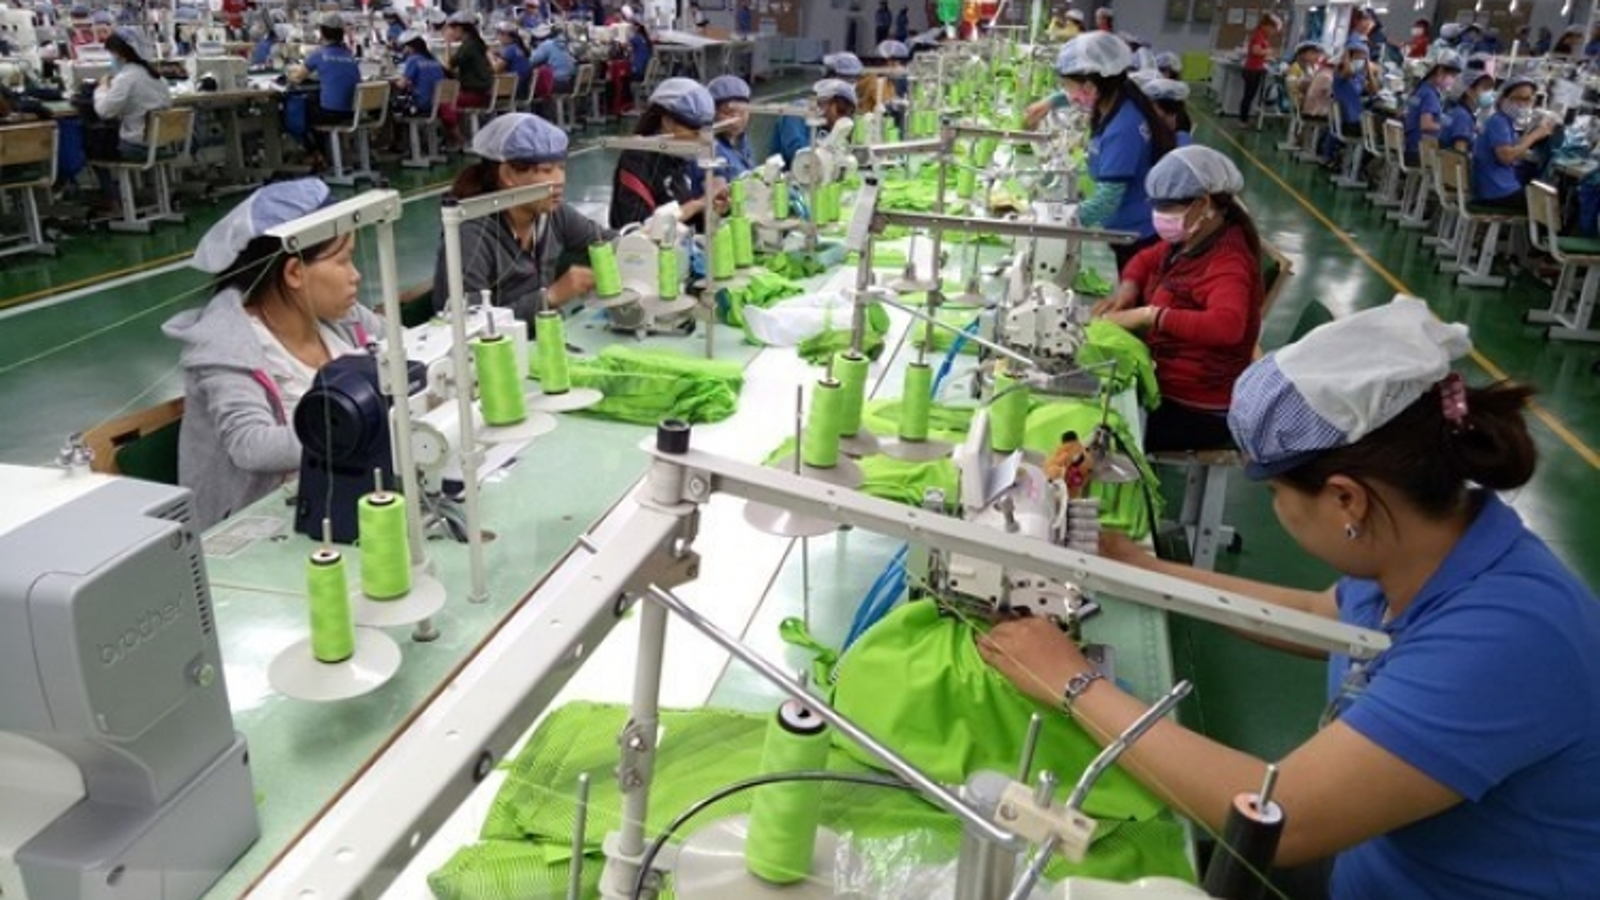 EVFTA opens new era in Vietnam-EU trade ties: Italian experts